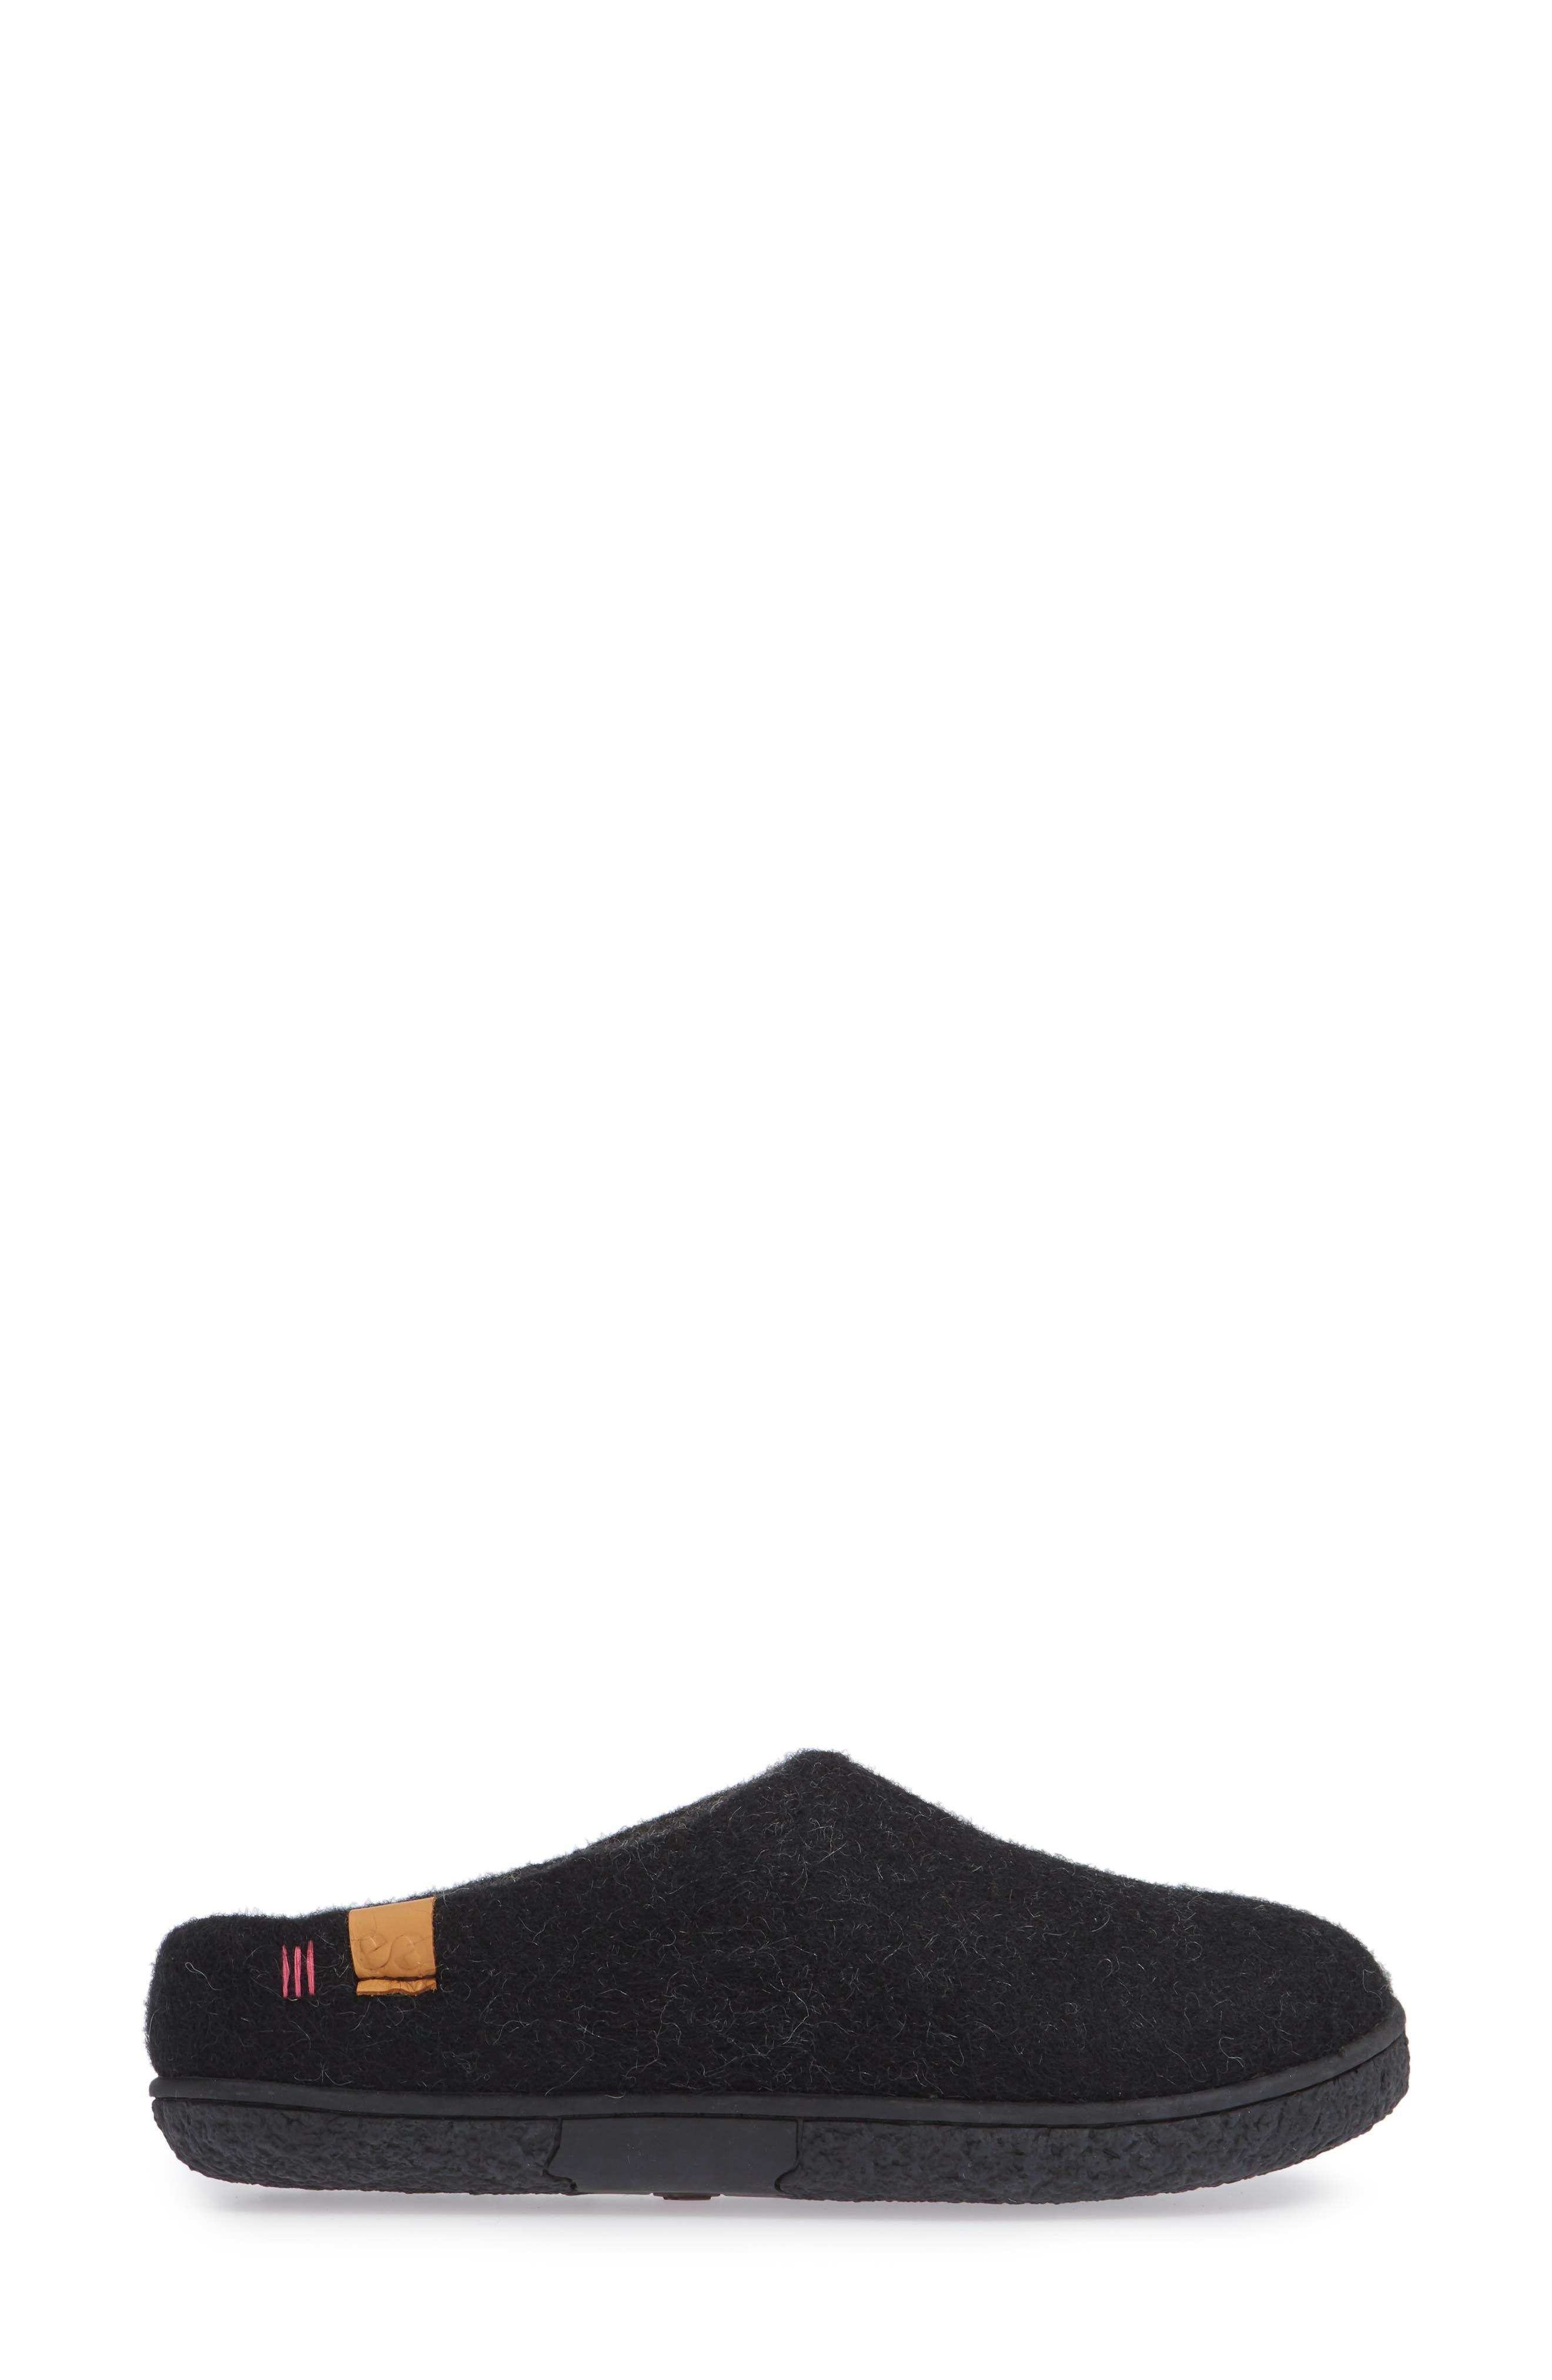 Tibet Wool Slipper,                             Alternate thumbnail 3, color,                             BLACK WOOL